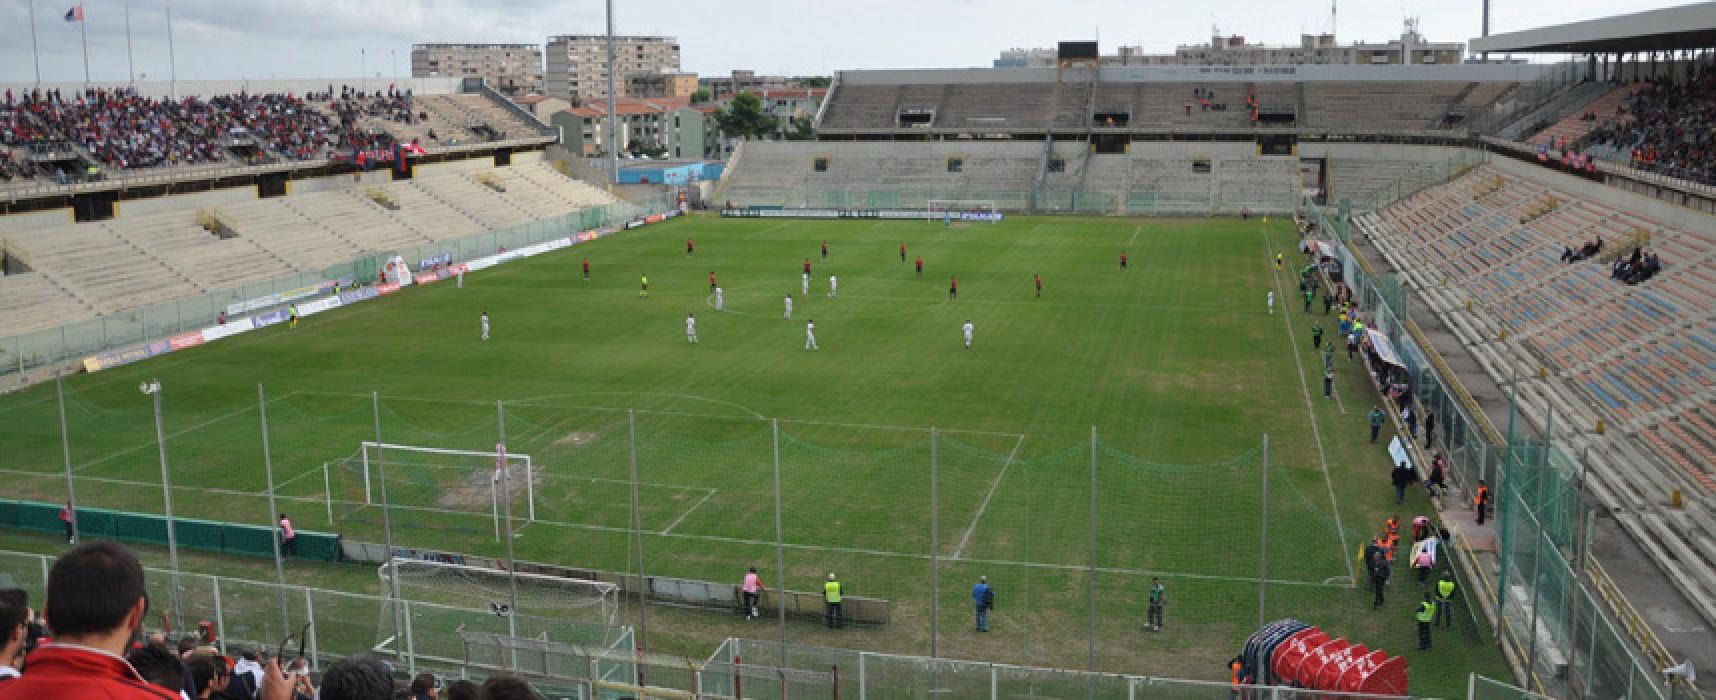 Taranto-Bisceglie, trasferta vietata ai tifosi neroazzurri